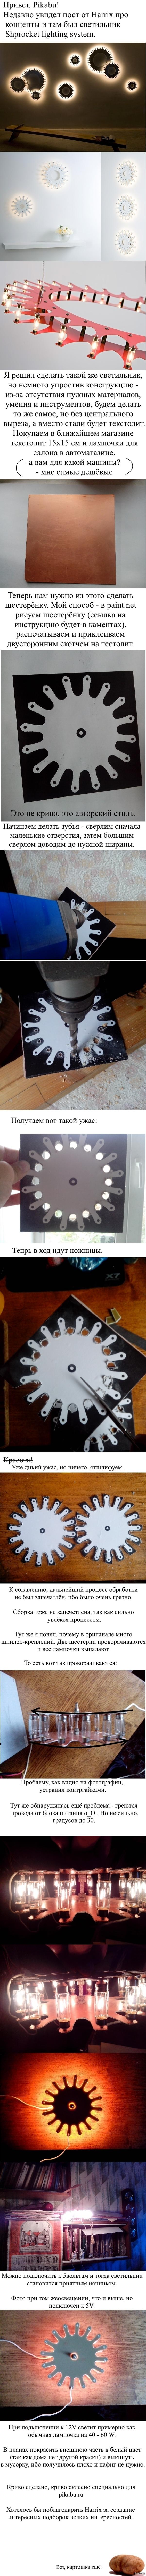 "Самодельная лампа-шестерёнка В ответ на пост <a href=""http://pikabu.ru/story/strannyie_kontseptyi_120_2697317"">http://pikabu.ru/story/_2697317</a>"